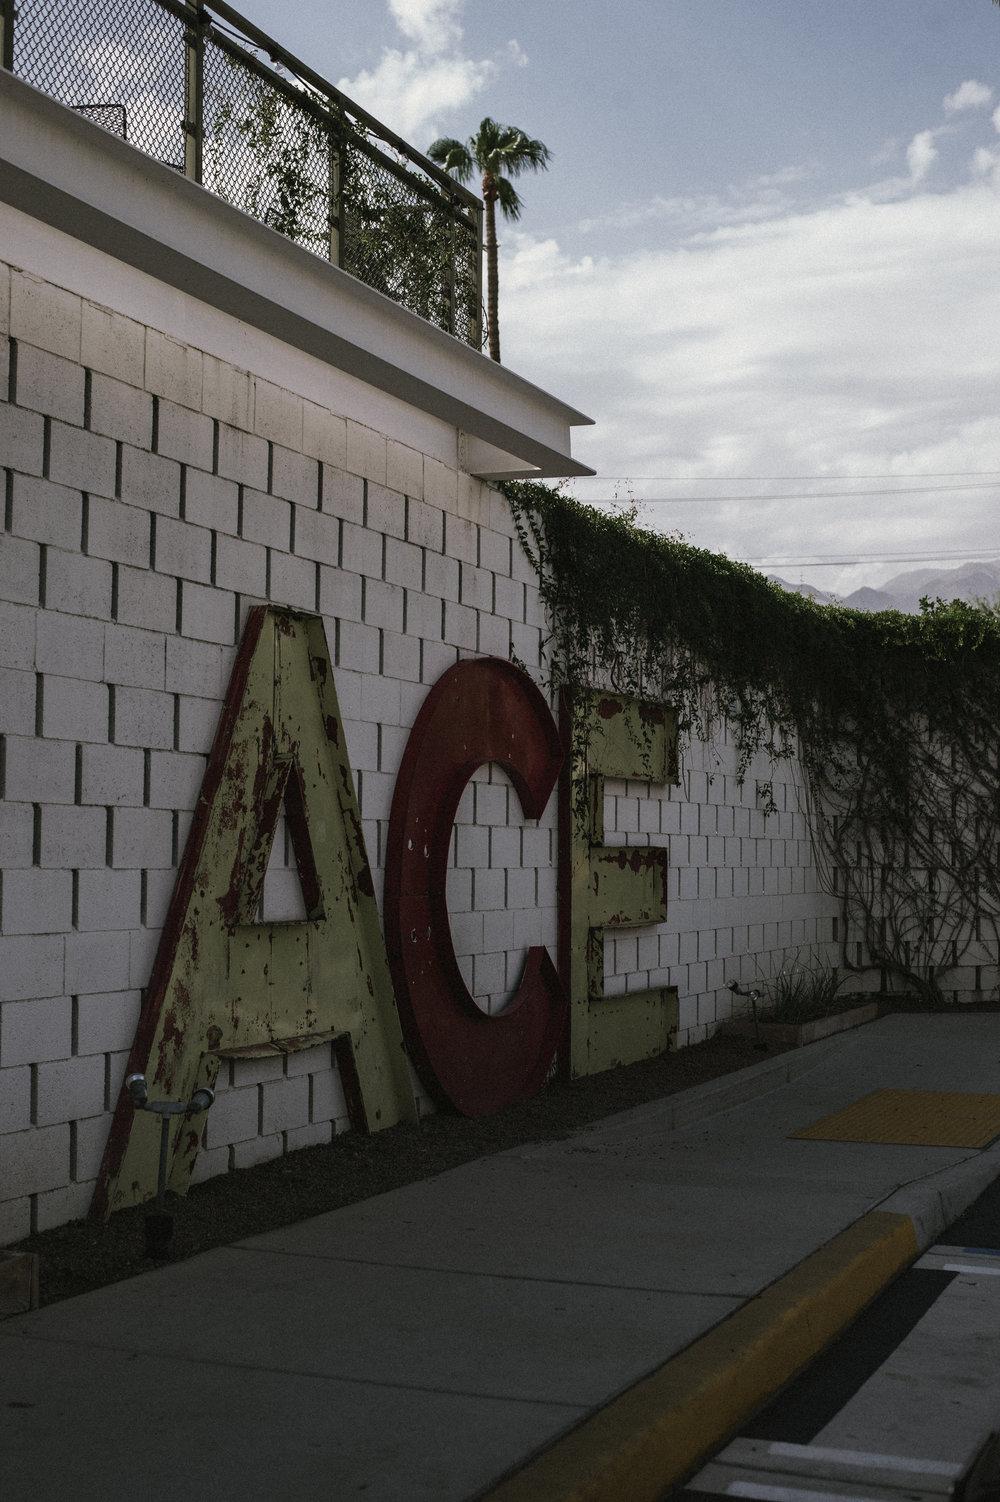 The-Glossier-Ace-Hotel-Palm-Springs-CA-55.jpg